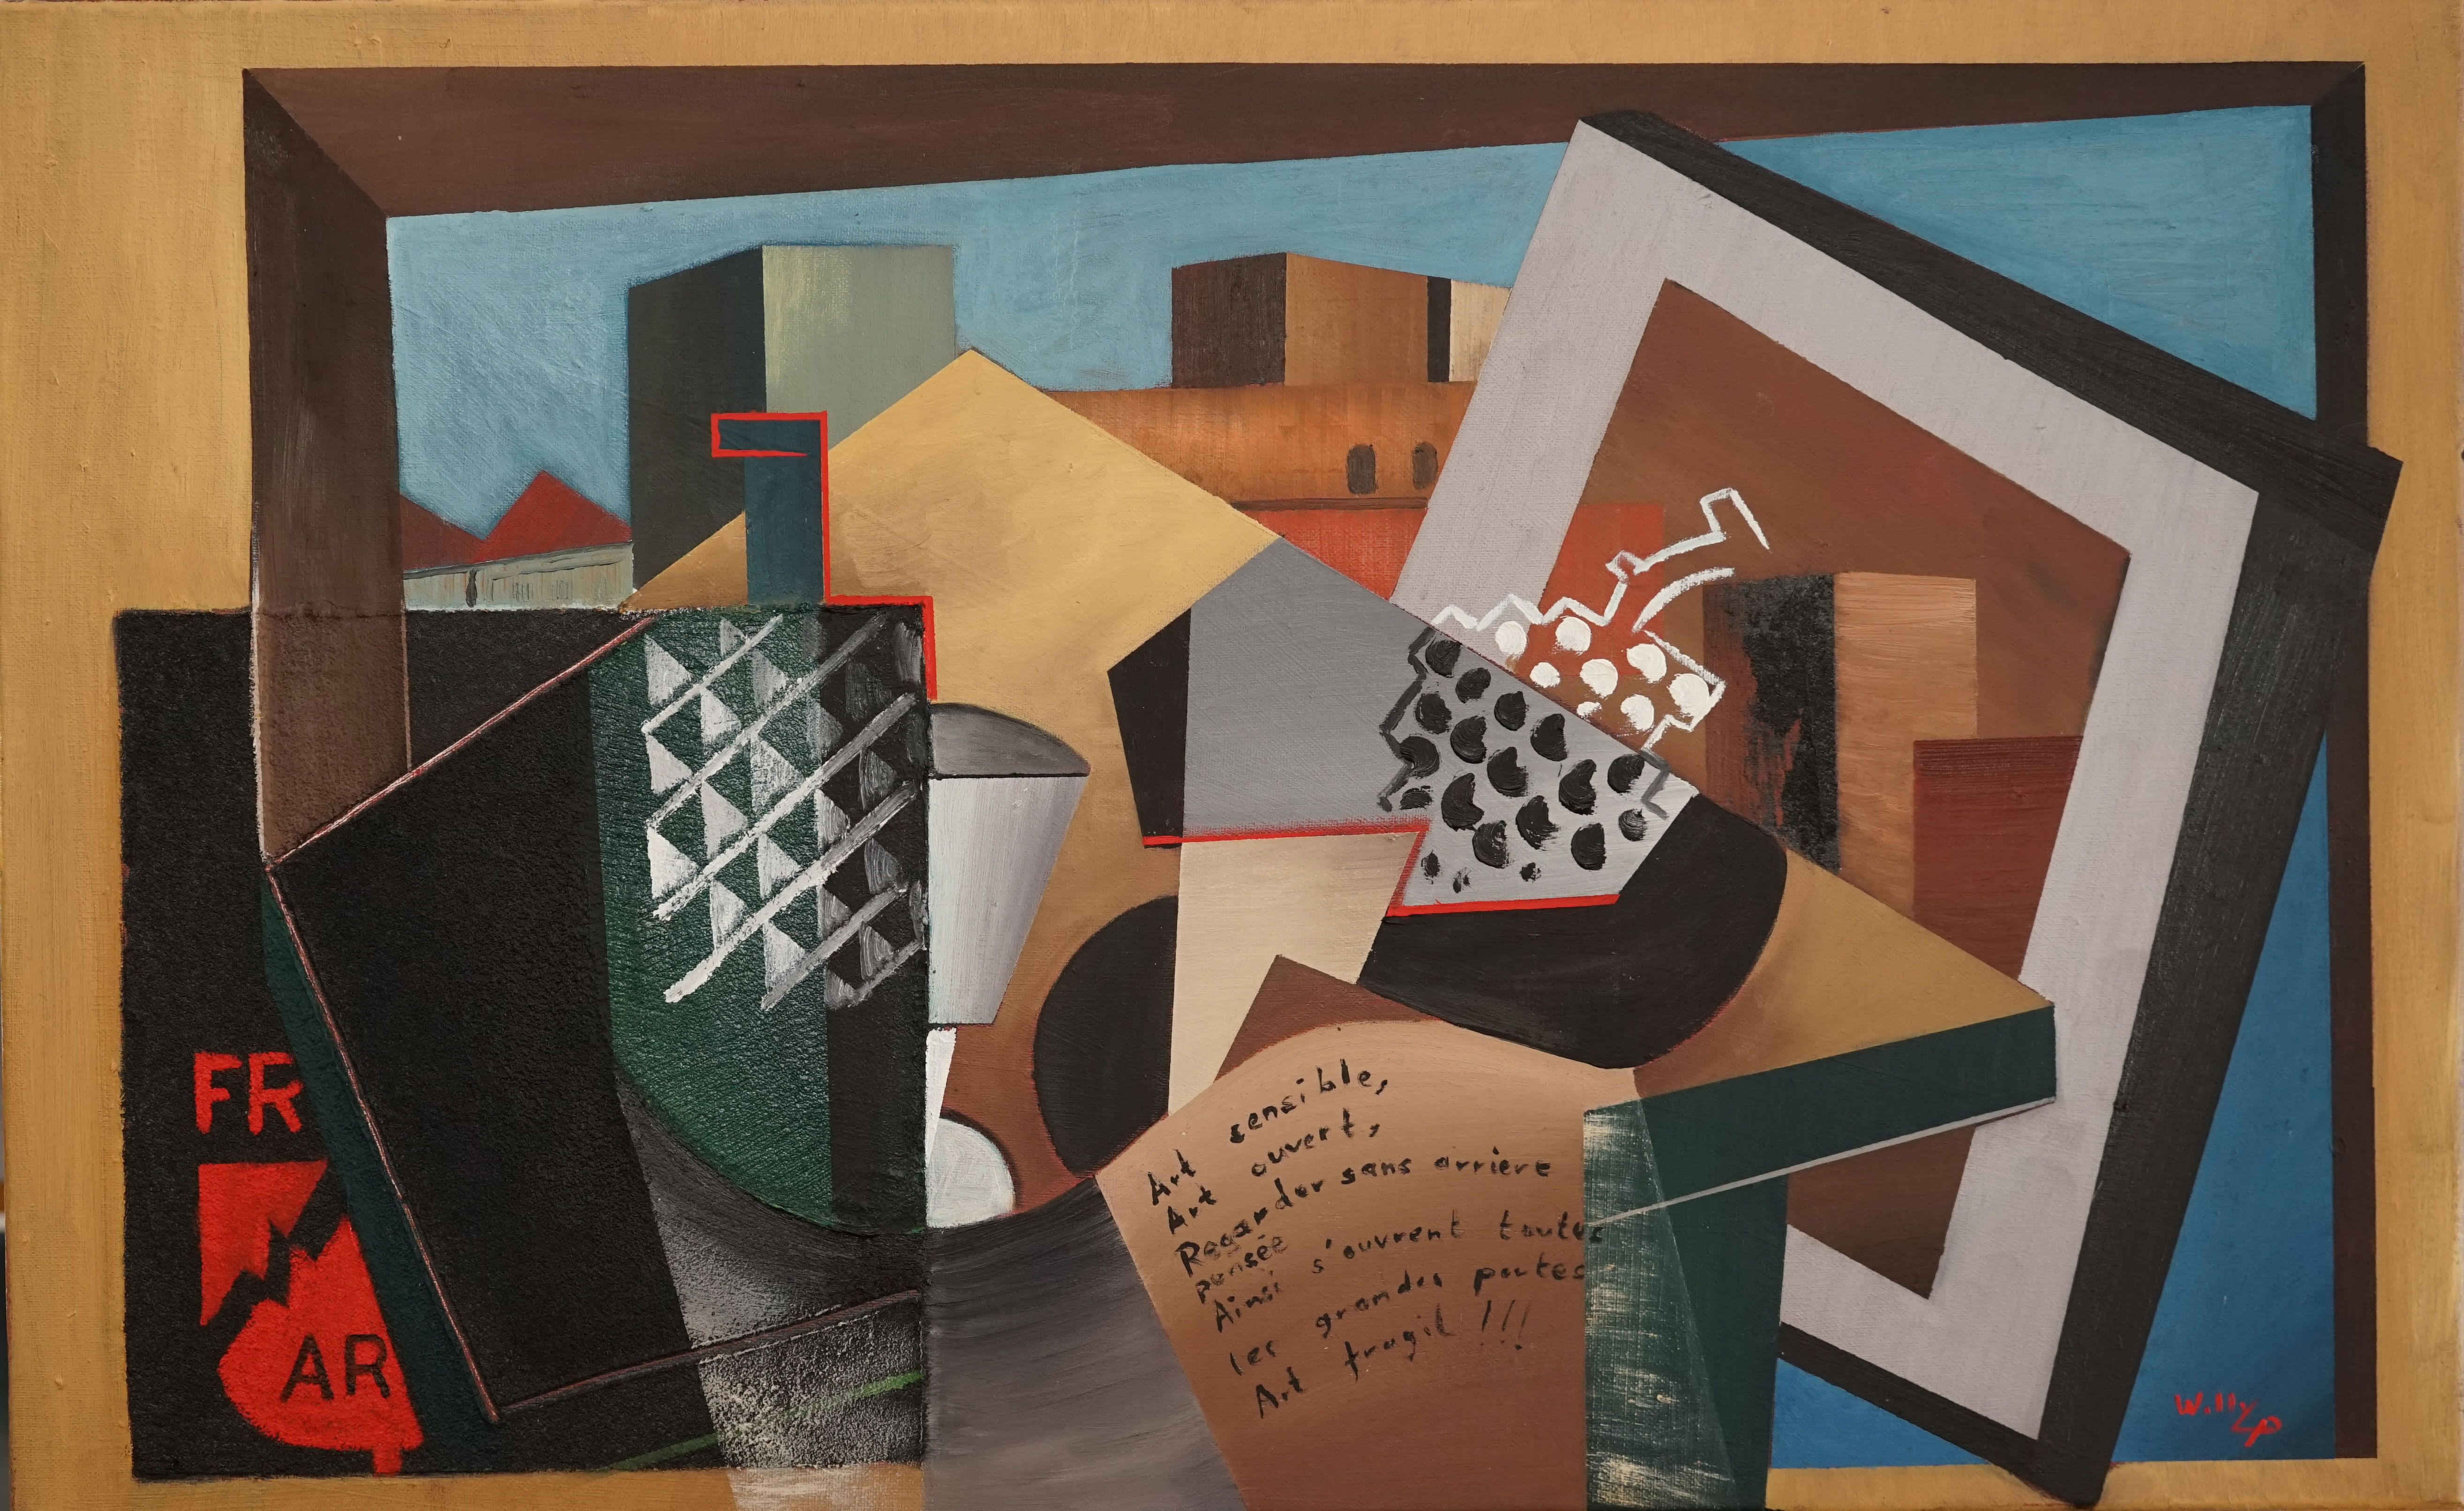 Alhambra-Art-Fragil-38x61web